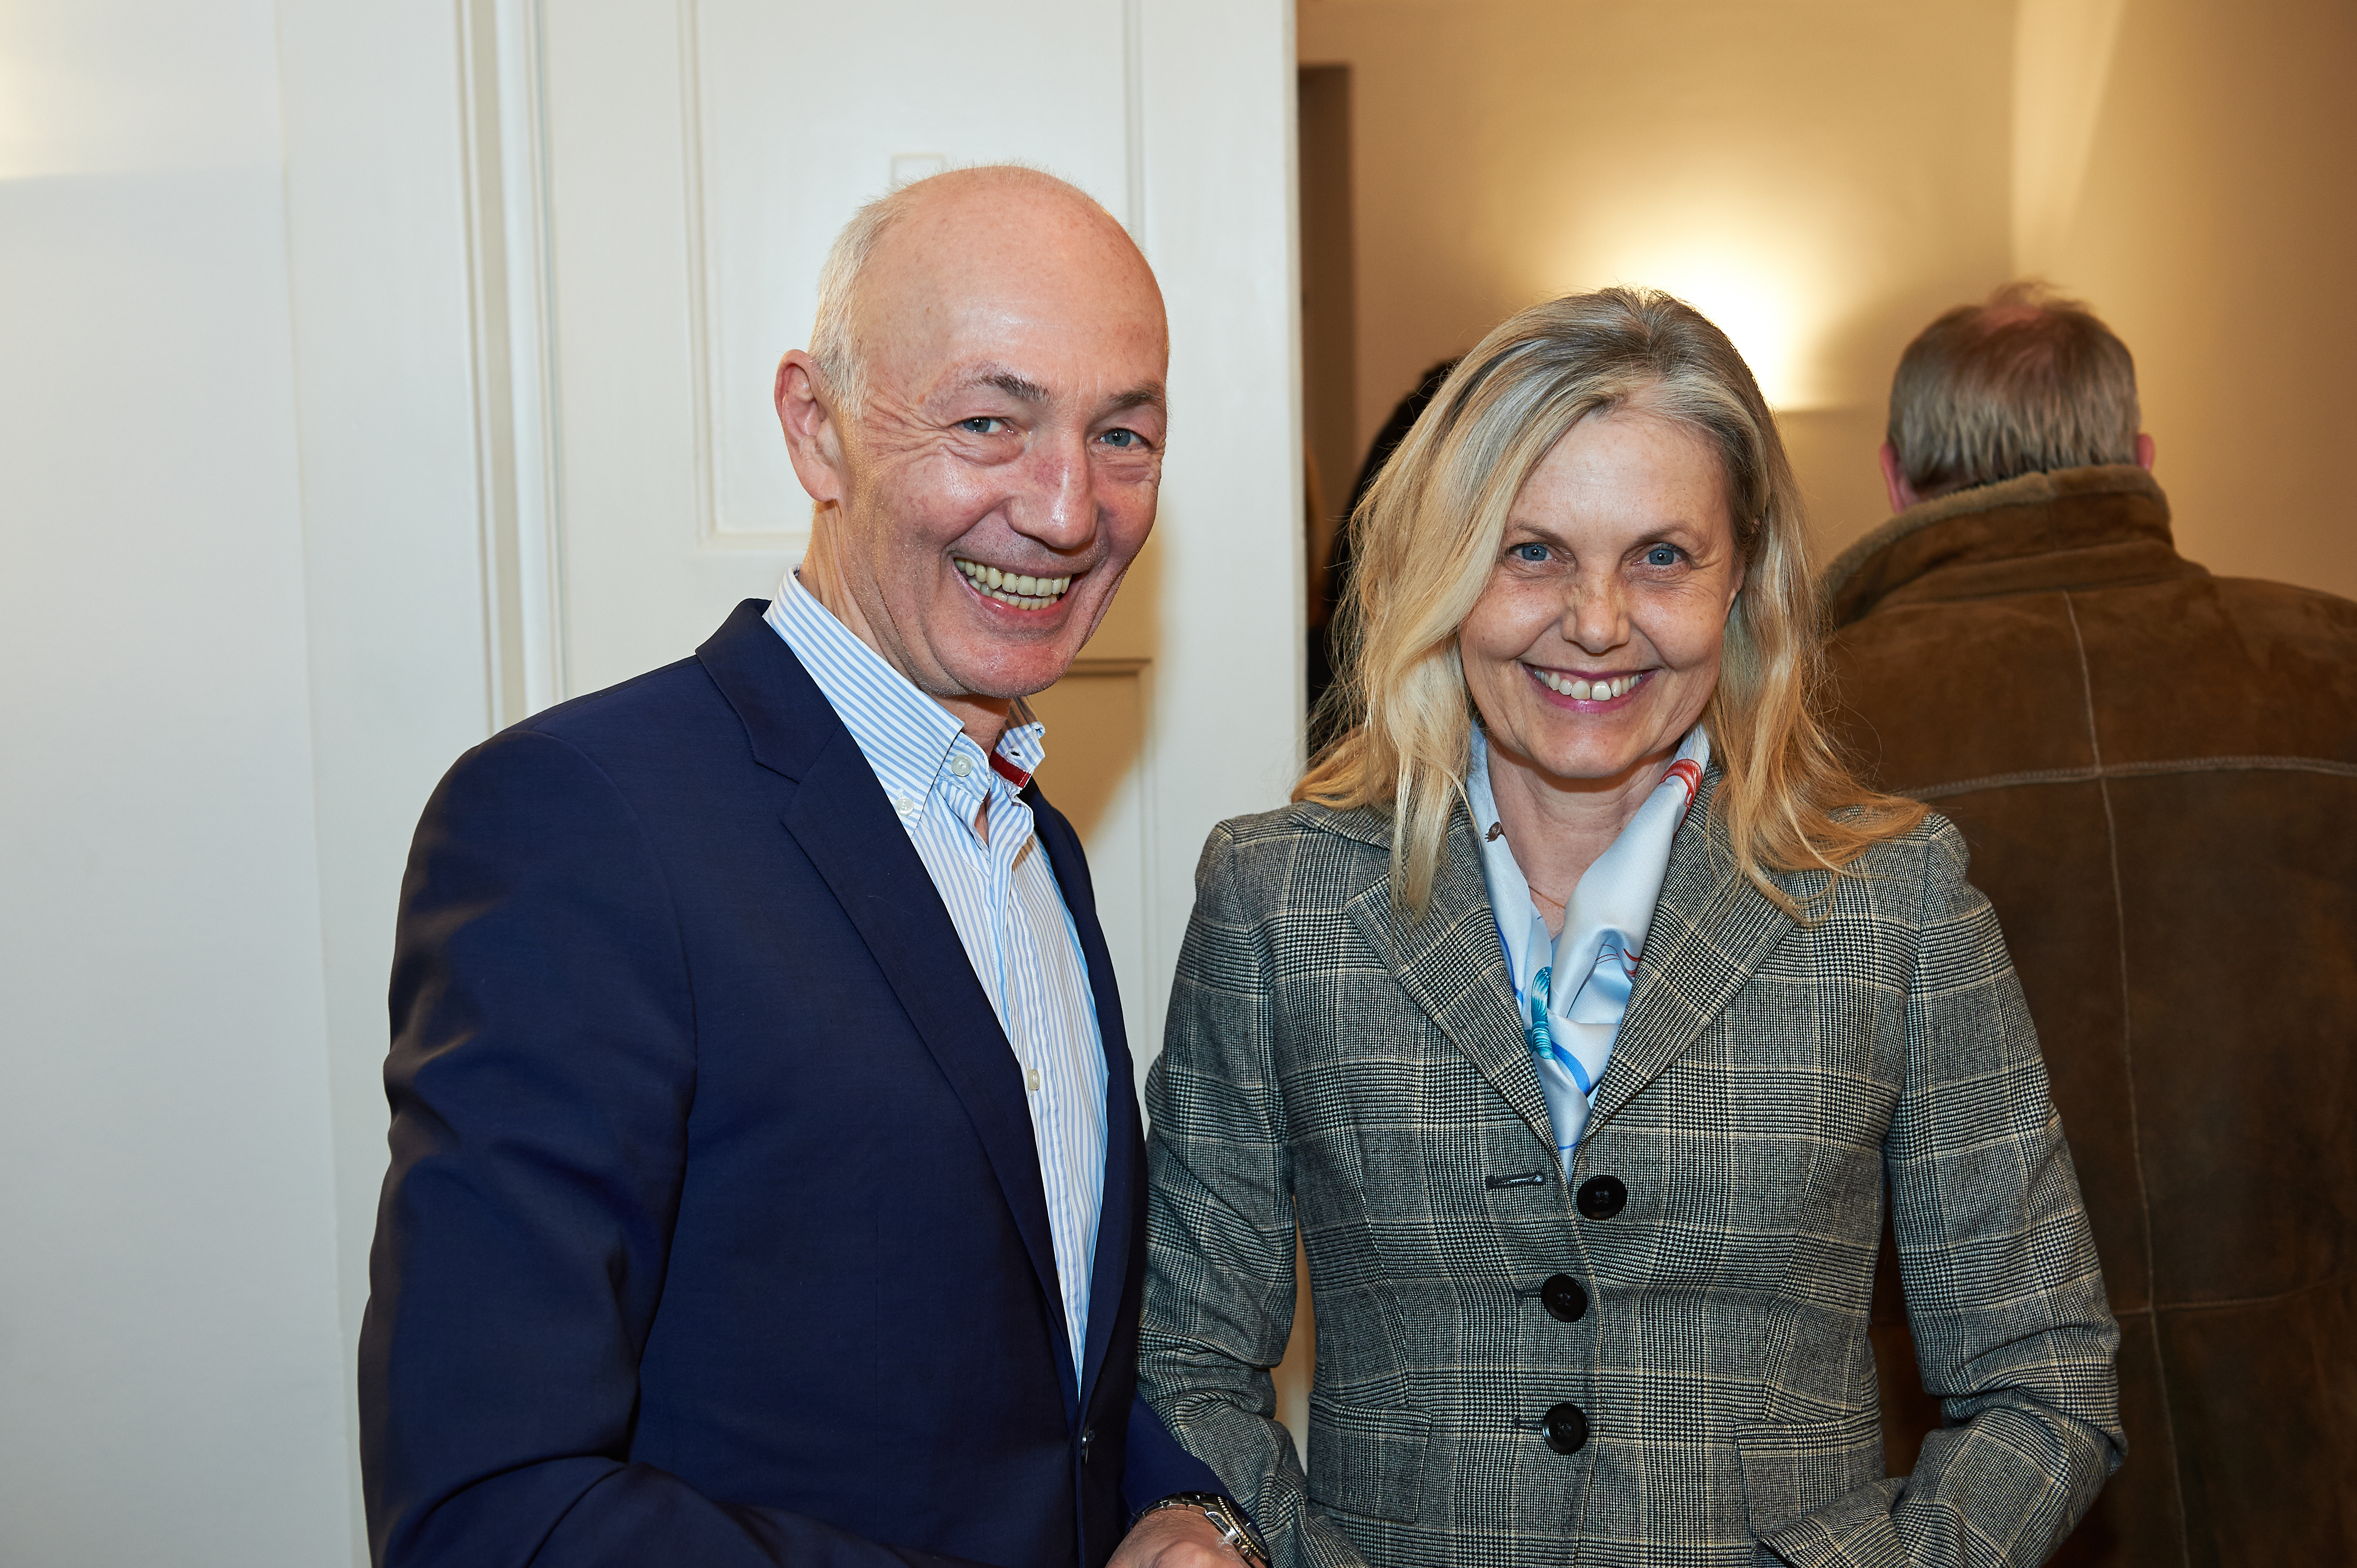 susanne heller 2 - Ilse Aigner zu Gast bei heller & partner